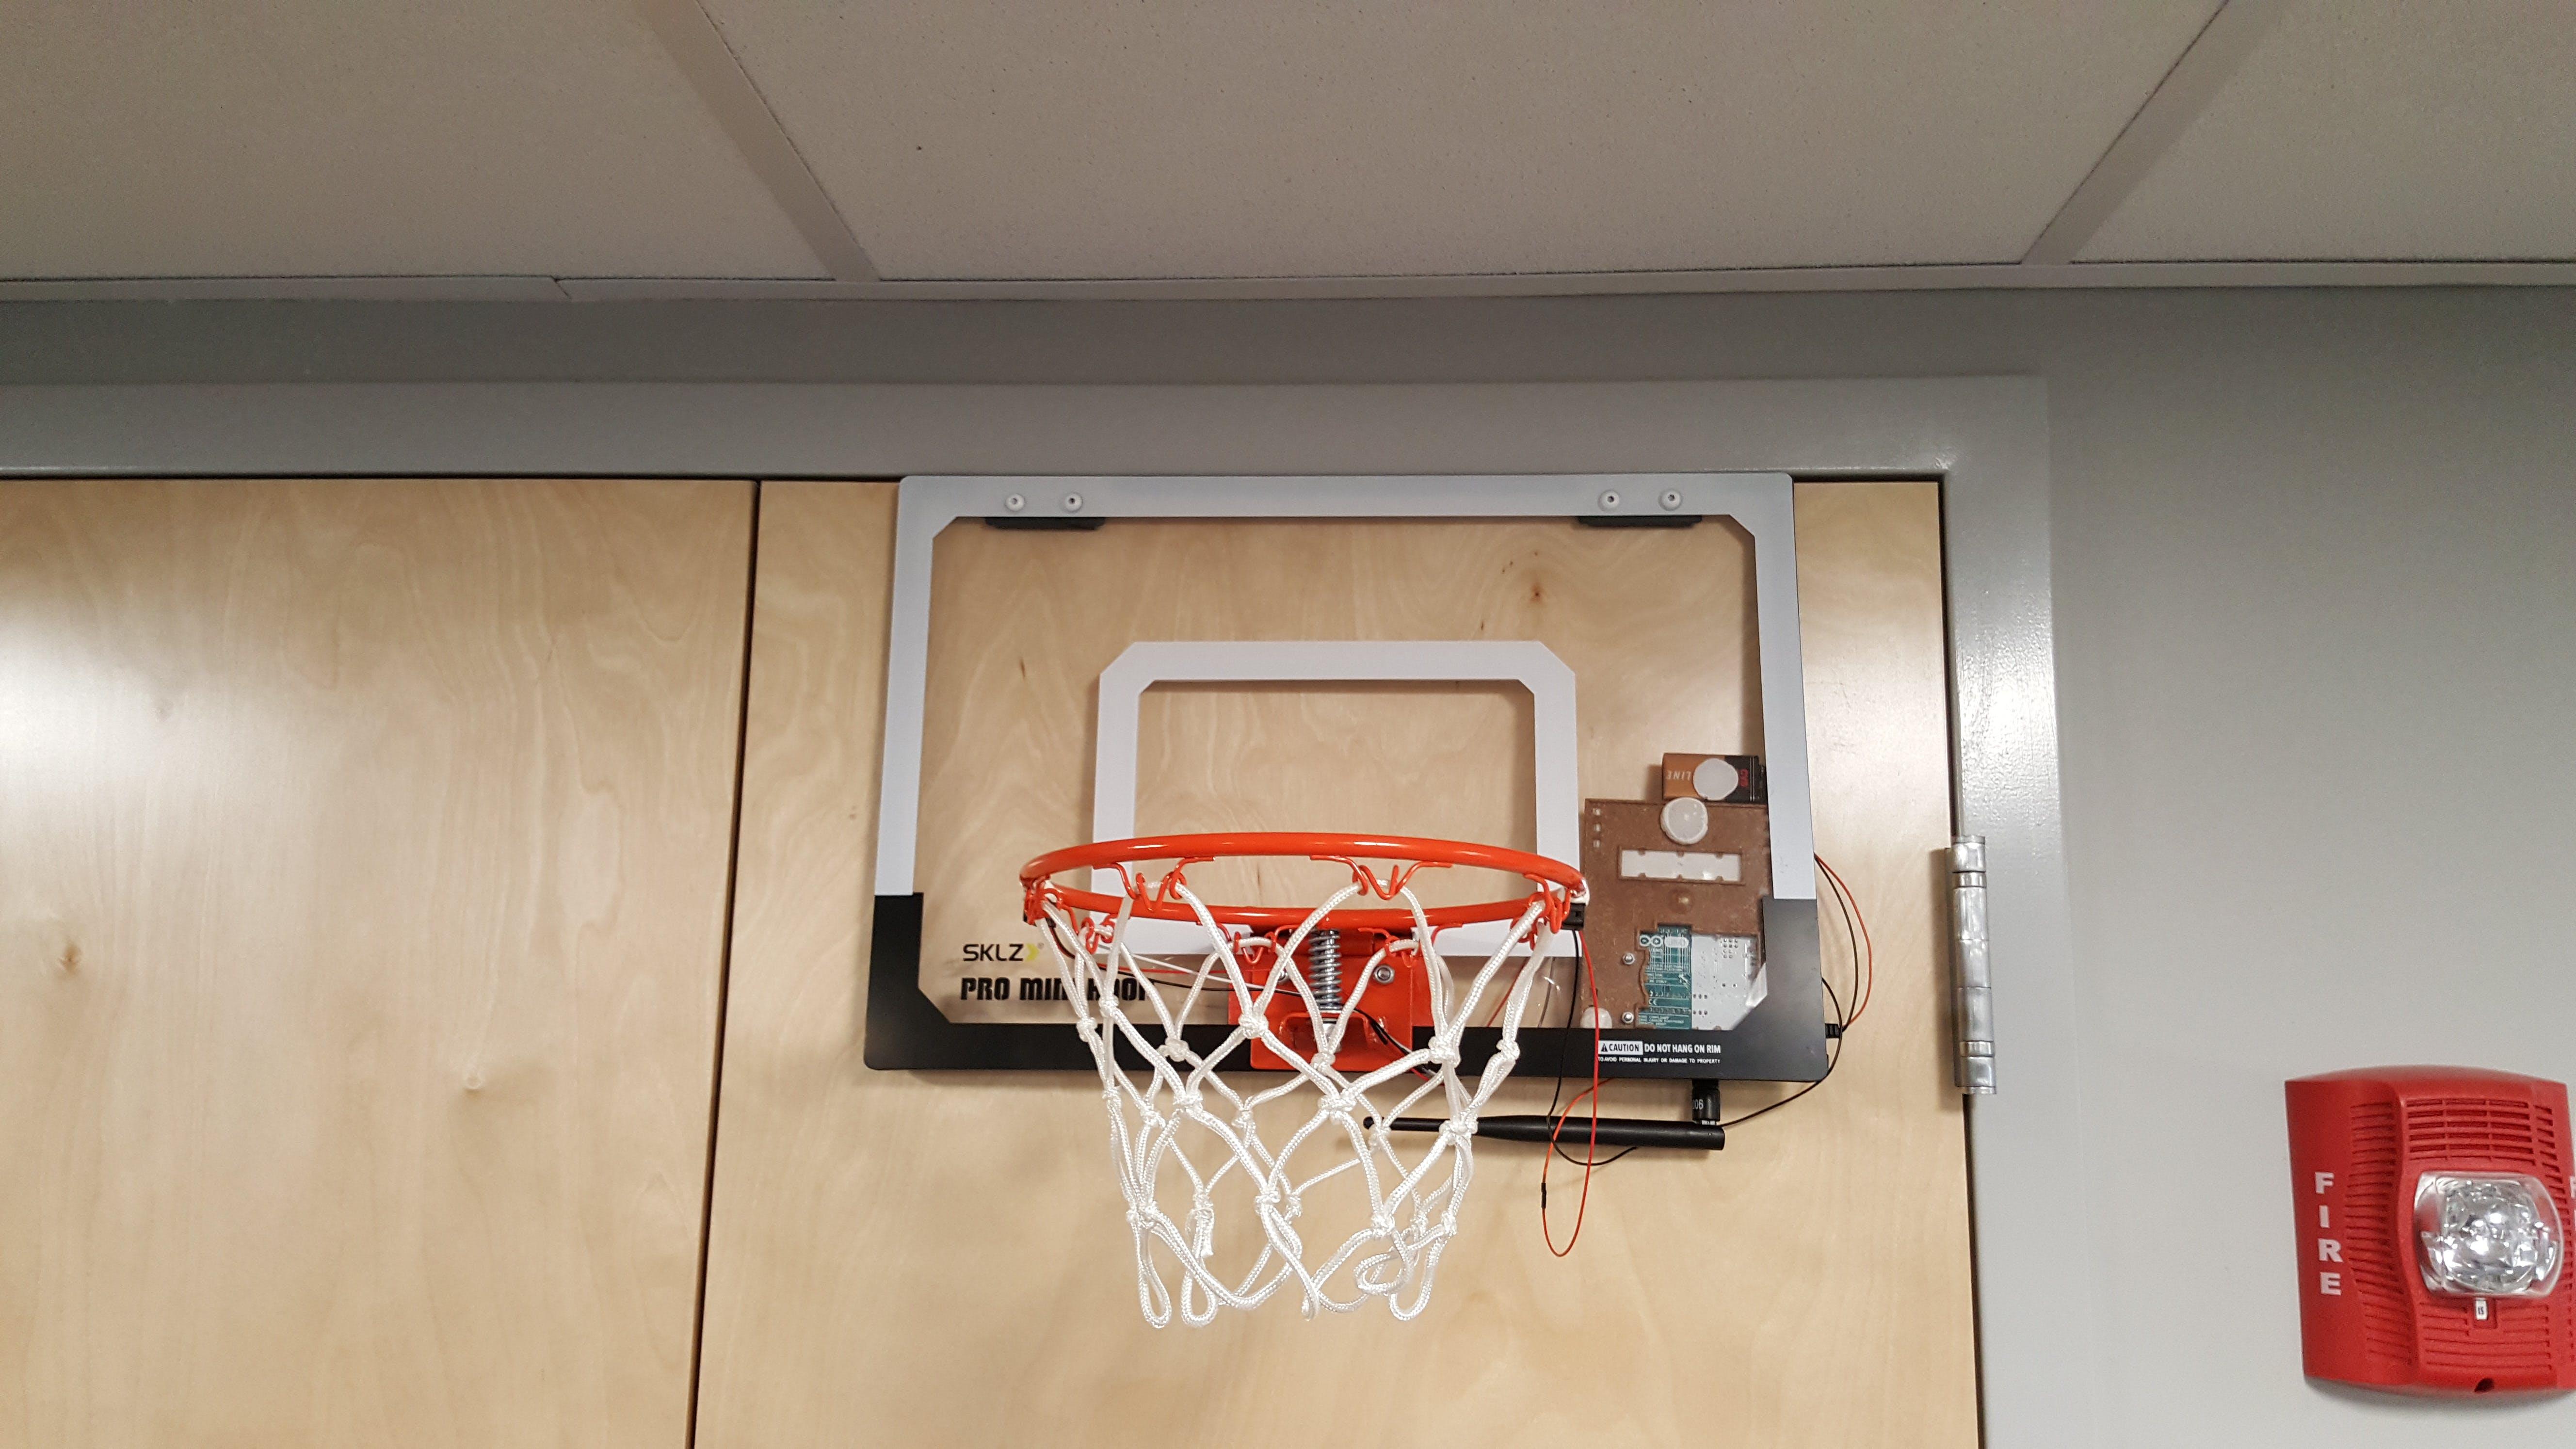 Connected hoop